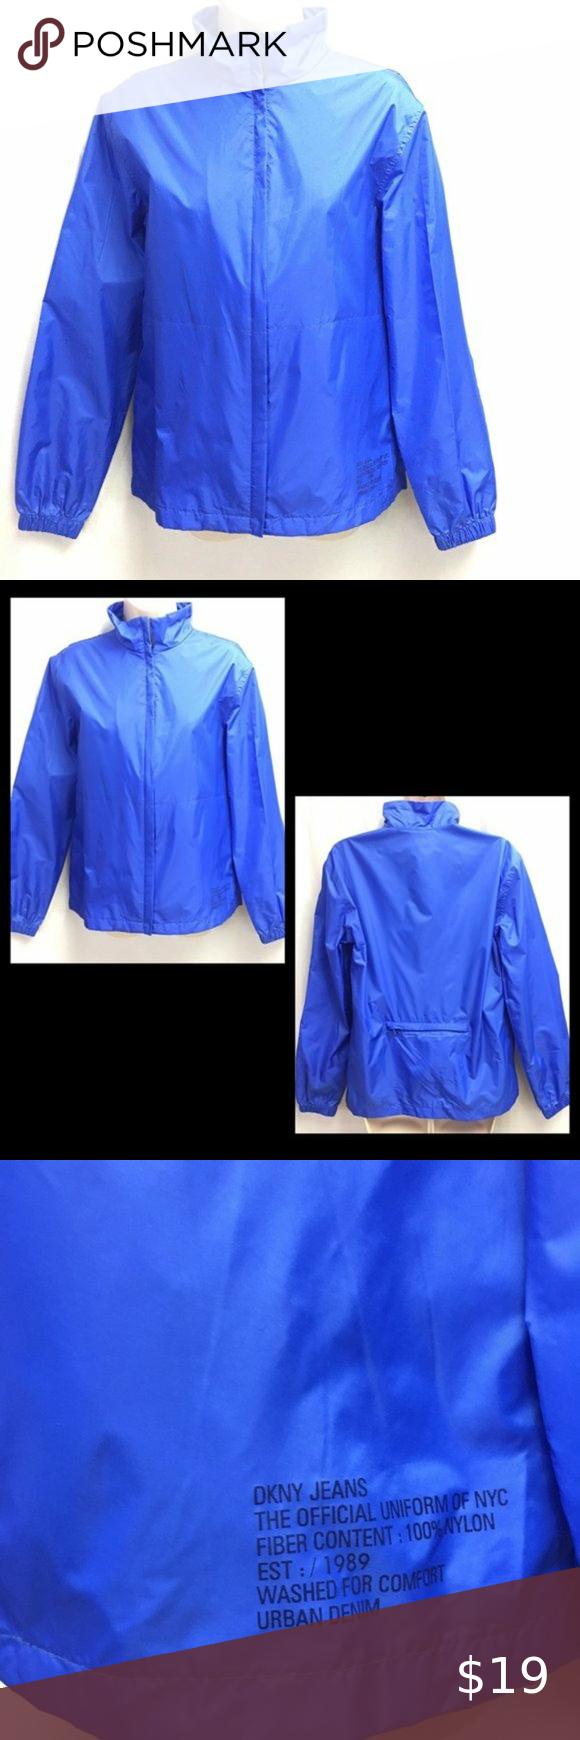 Dkny Blue Raincoat Xs Running Athletic Outerwear Dkny Blue Raincoat Size Xs Great For Running Athletic Outer Blue Raincoat Coats Jackets Women Long Puffer Coat [ 1740 x 580 Pixel ]